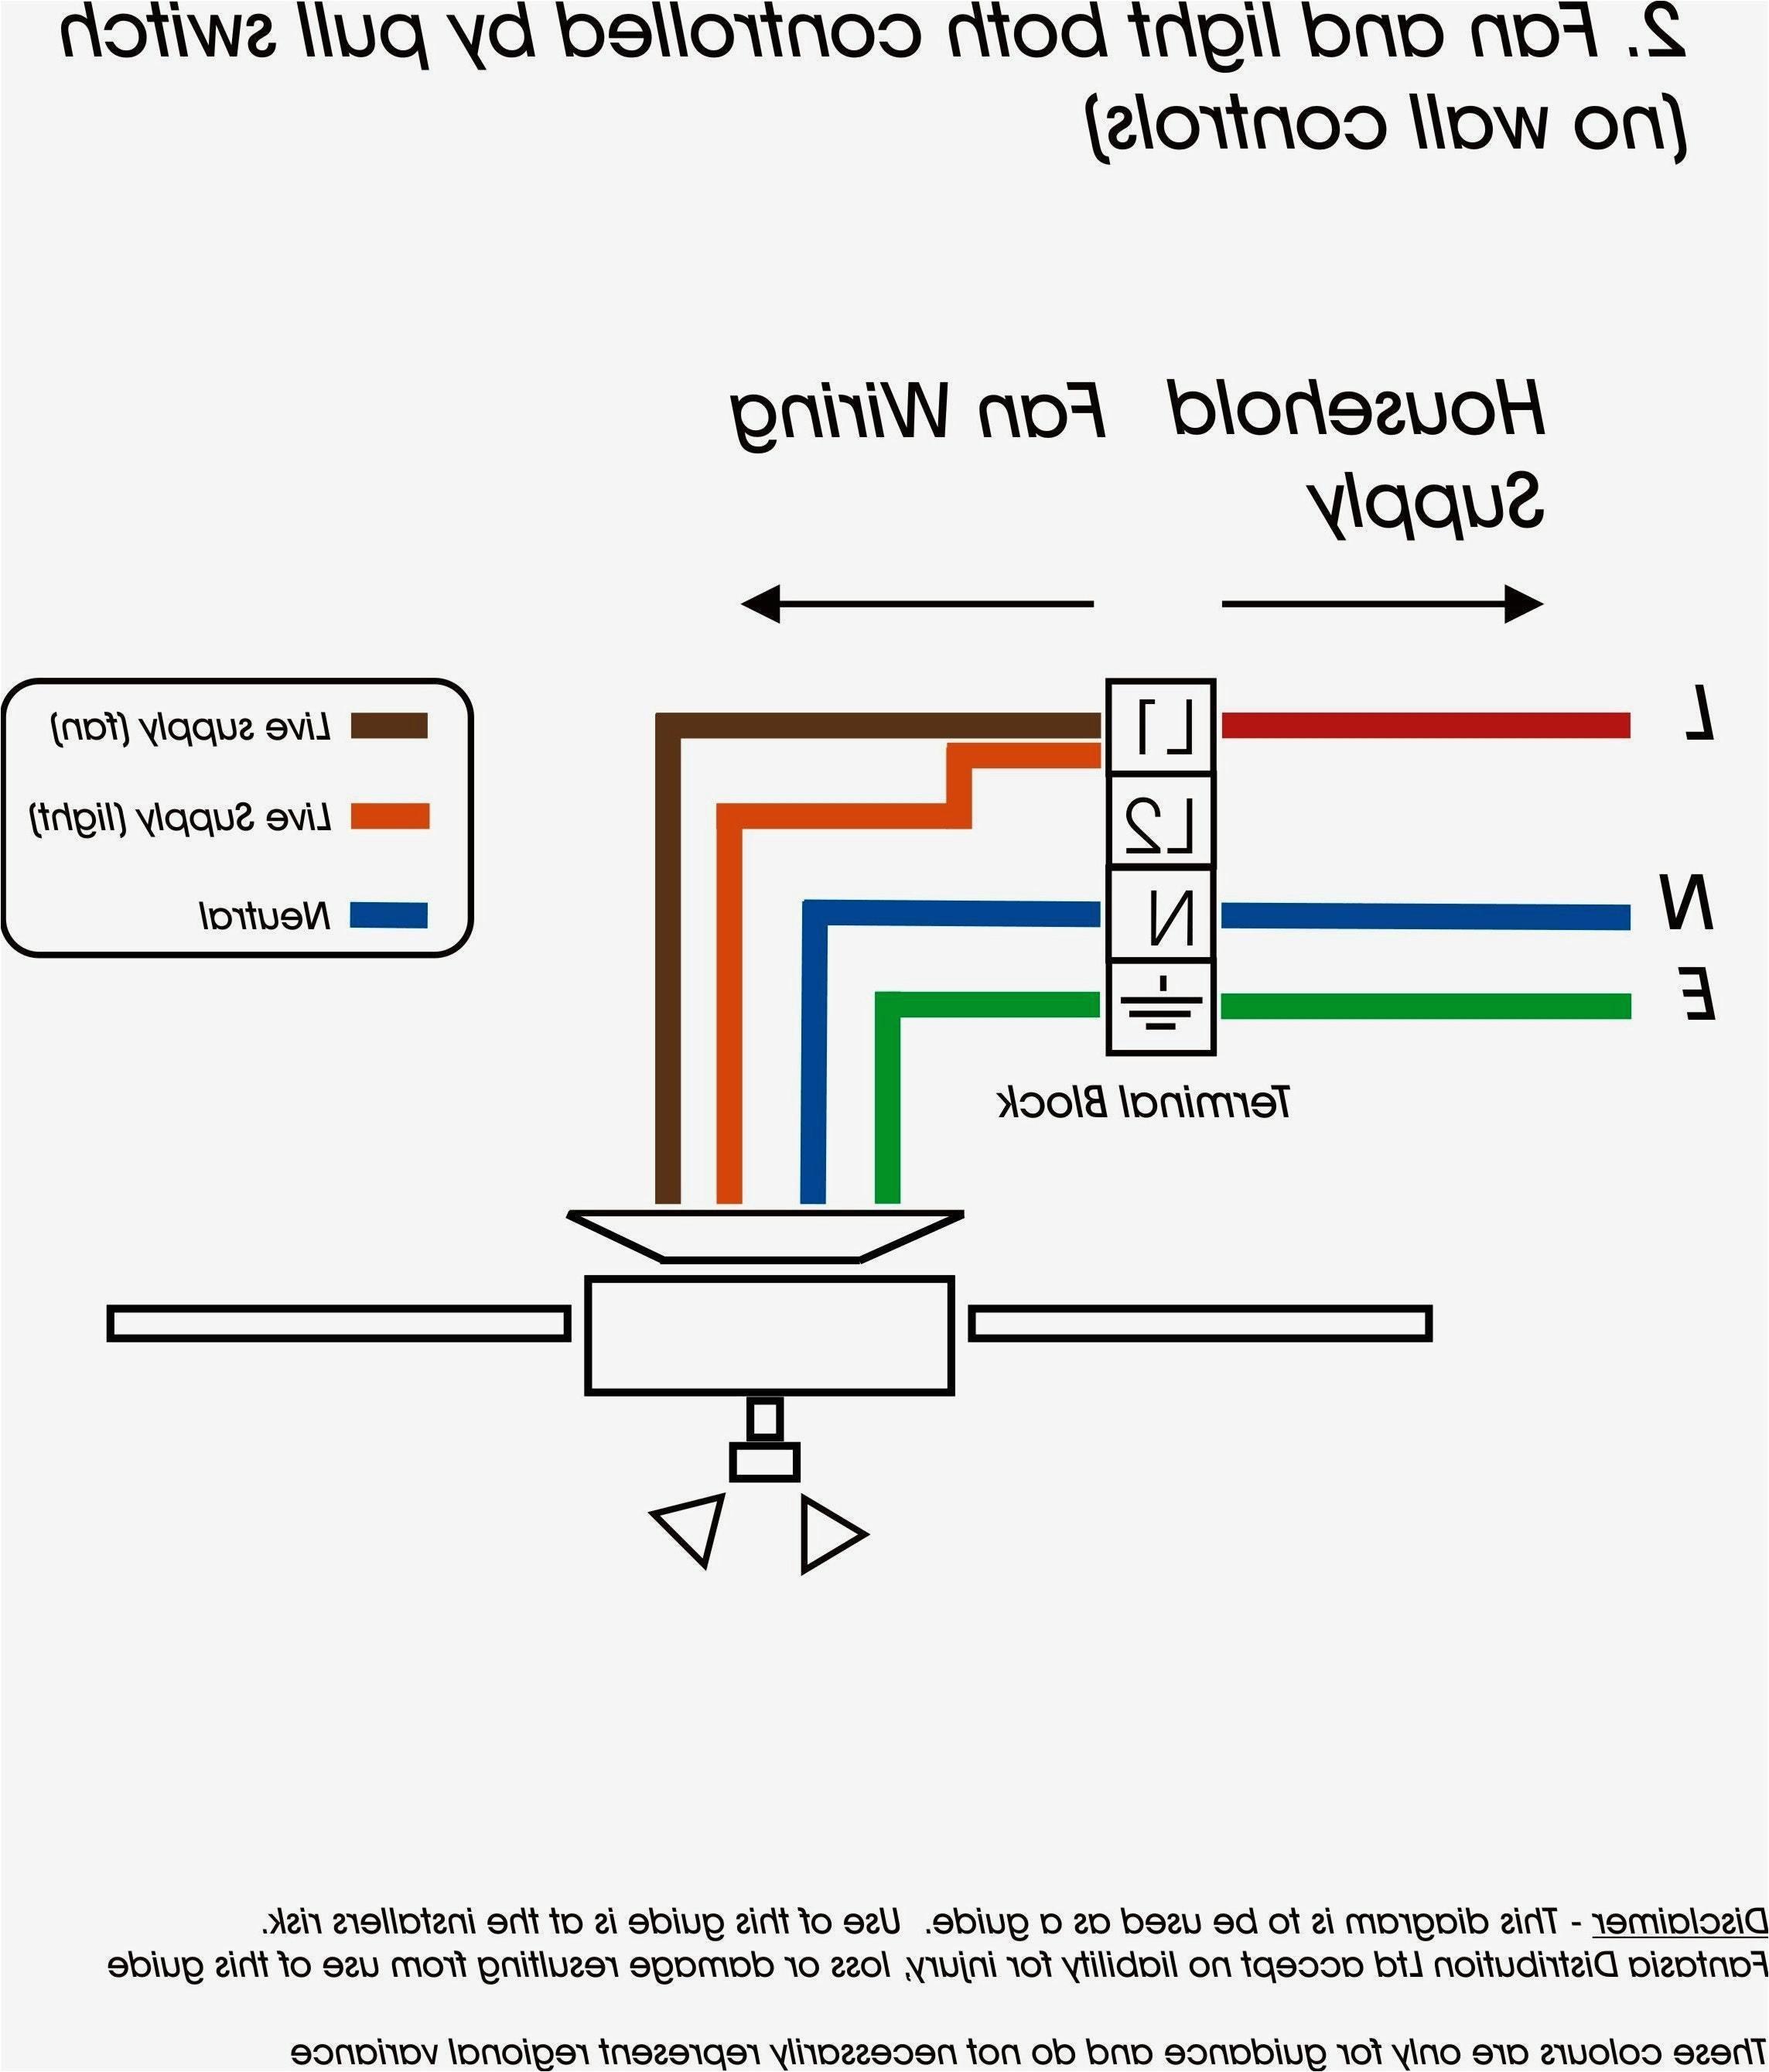 bremas boat lift switch wiring diagram free picture data wiring aos boat lift switch wiring diagram